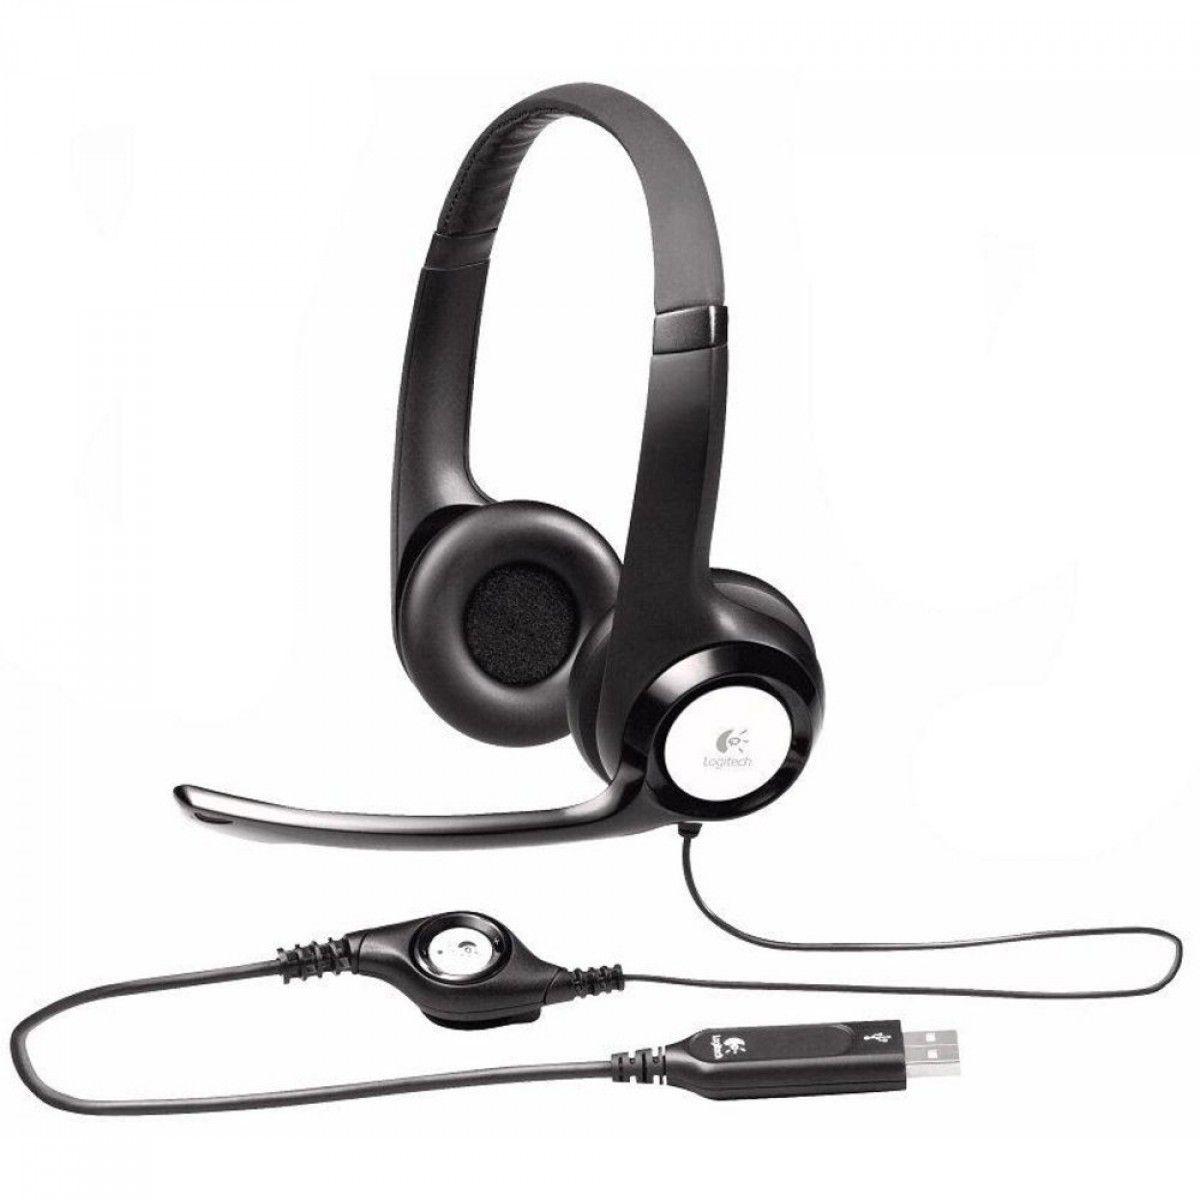 Headset Logitech H390 Preto Couro - USB, com Microfone